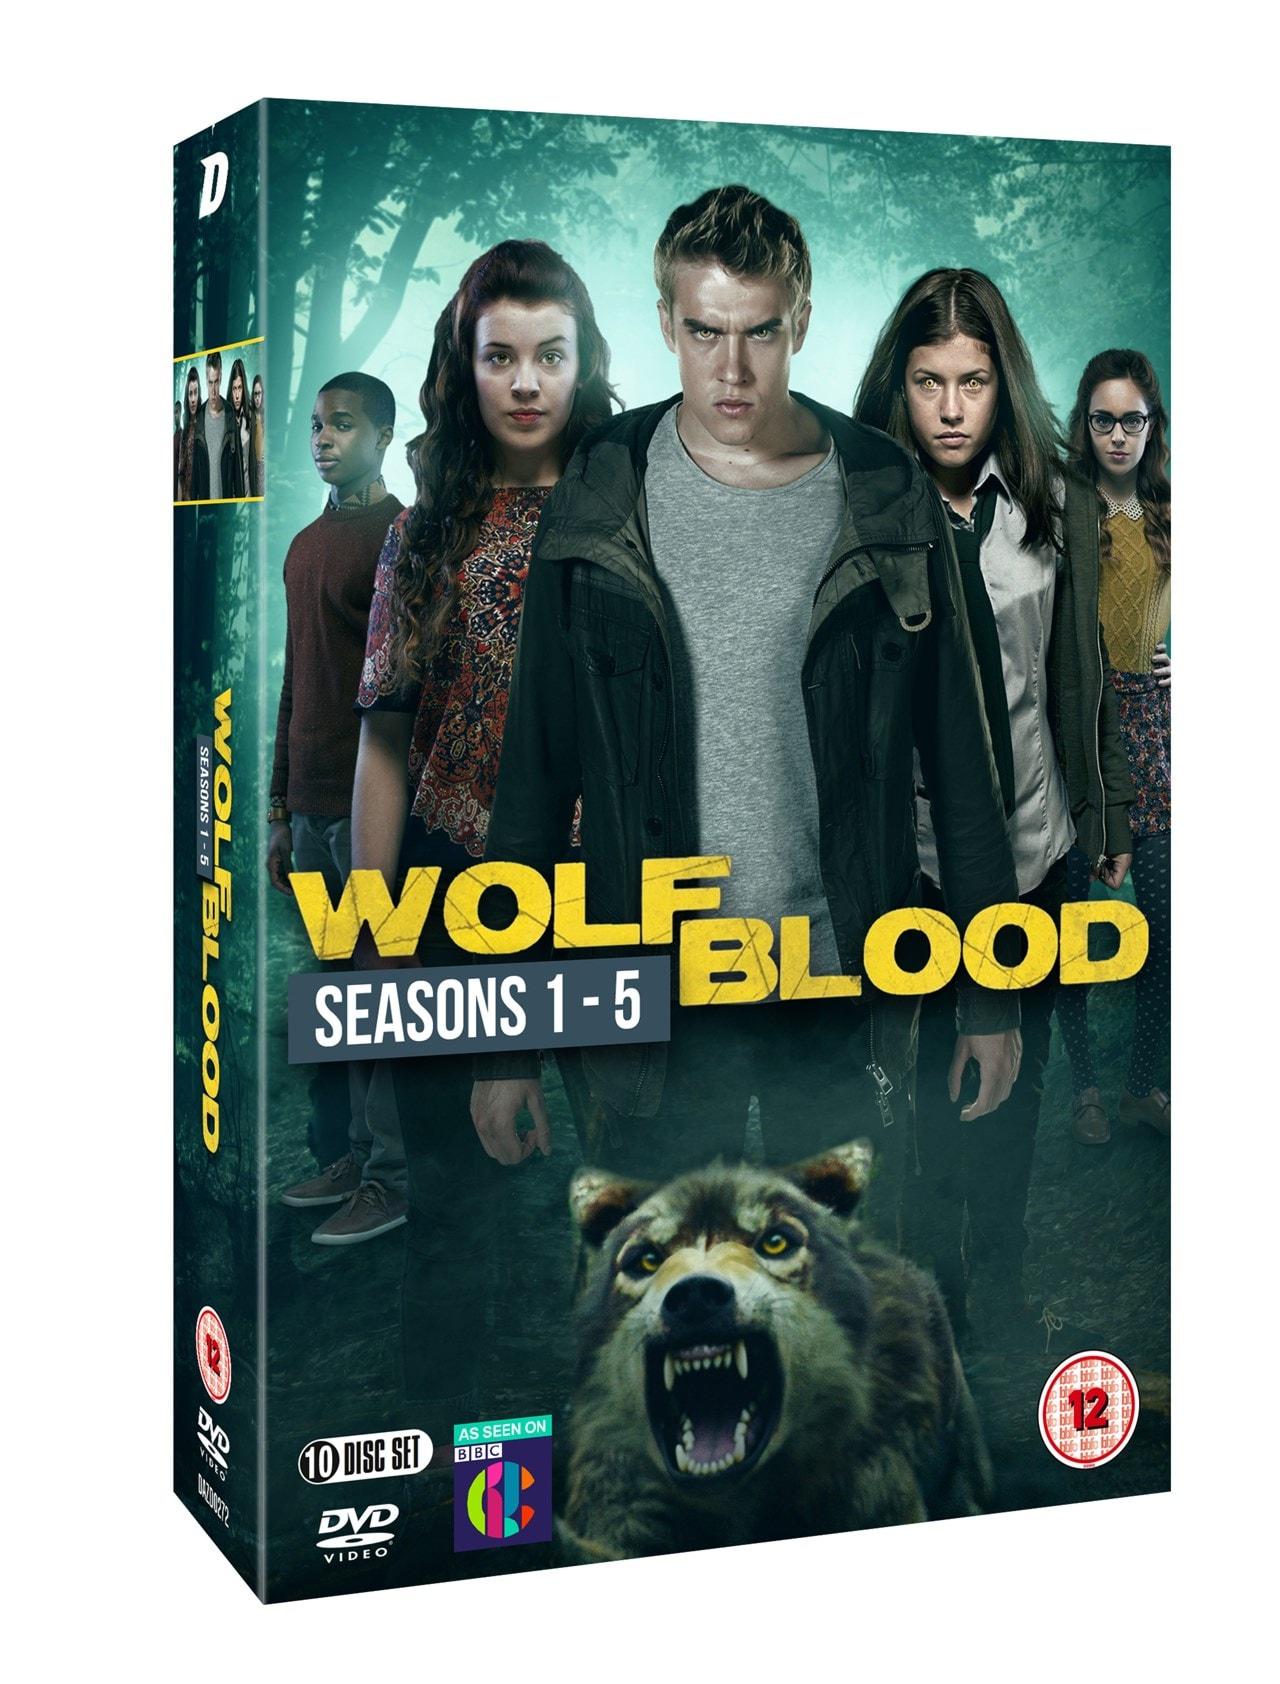 Wolfblood: Seasons 1-5 - 2